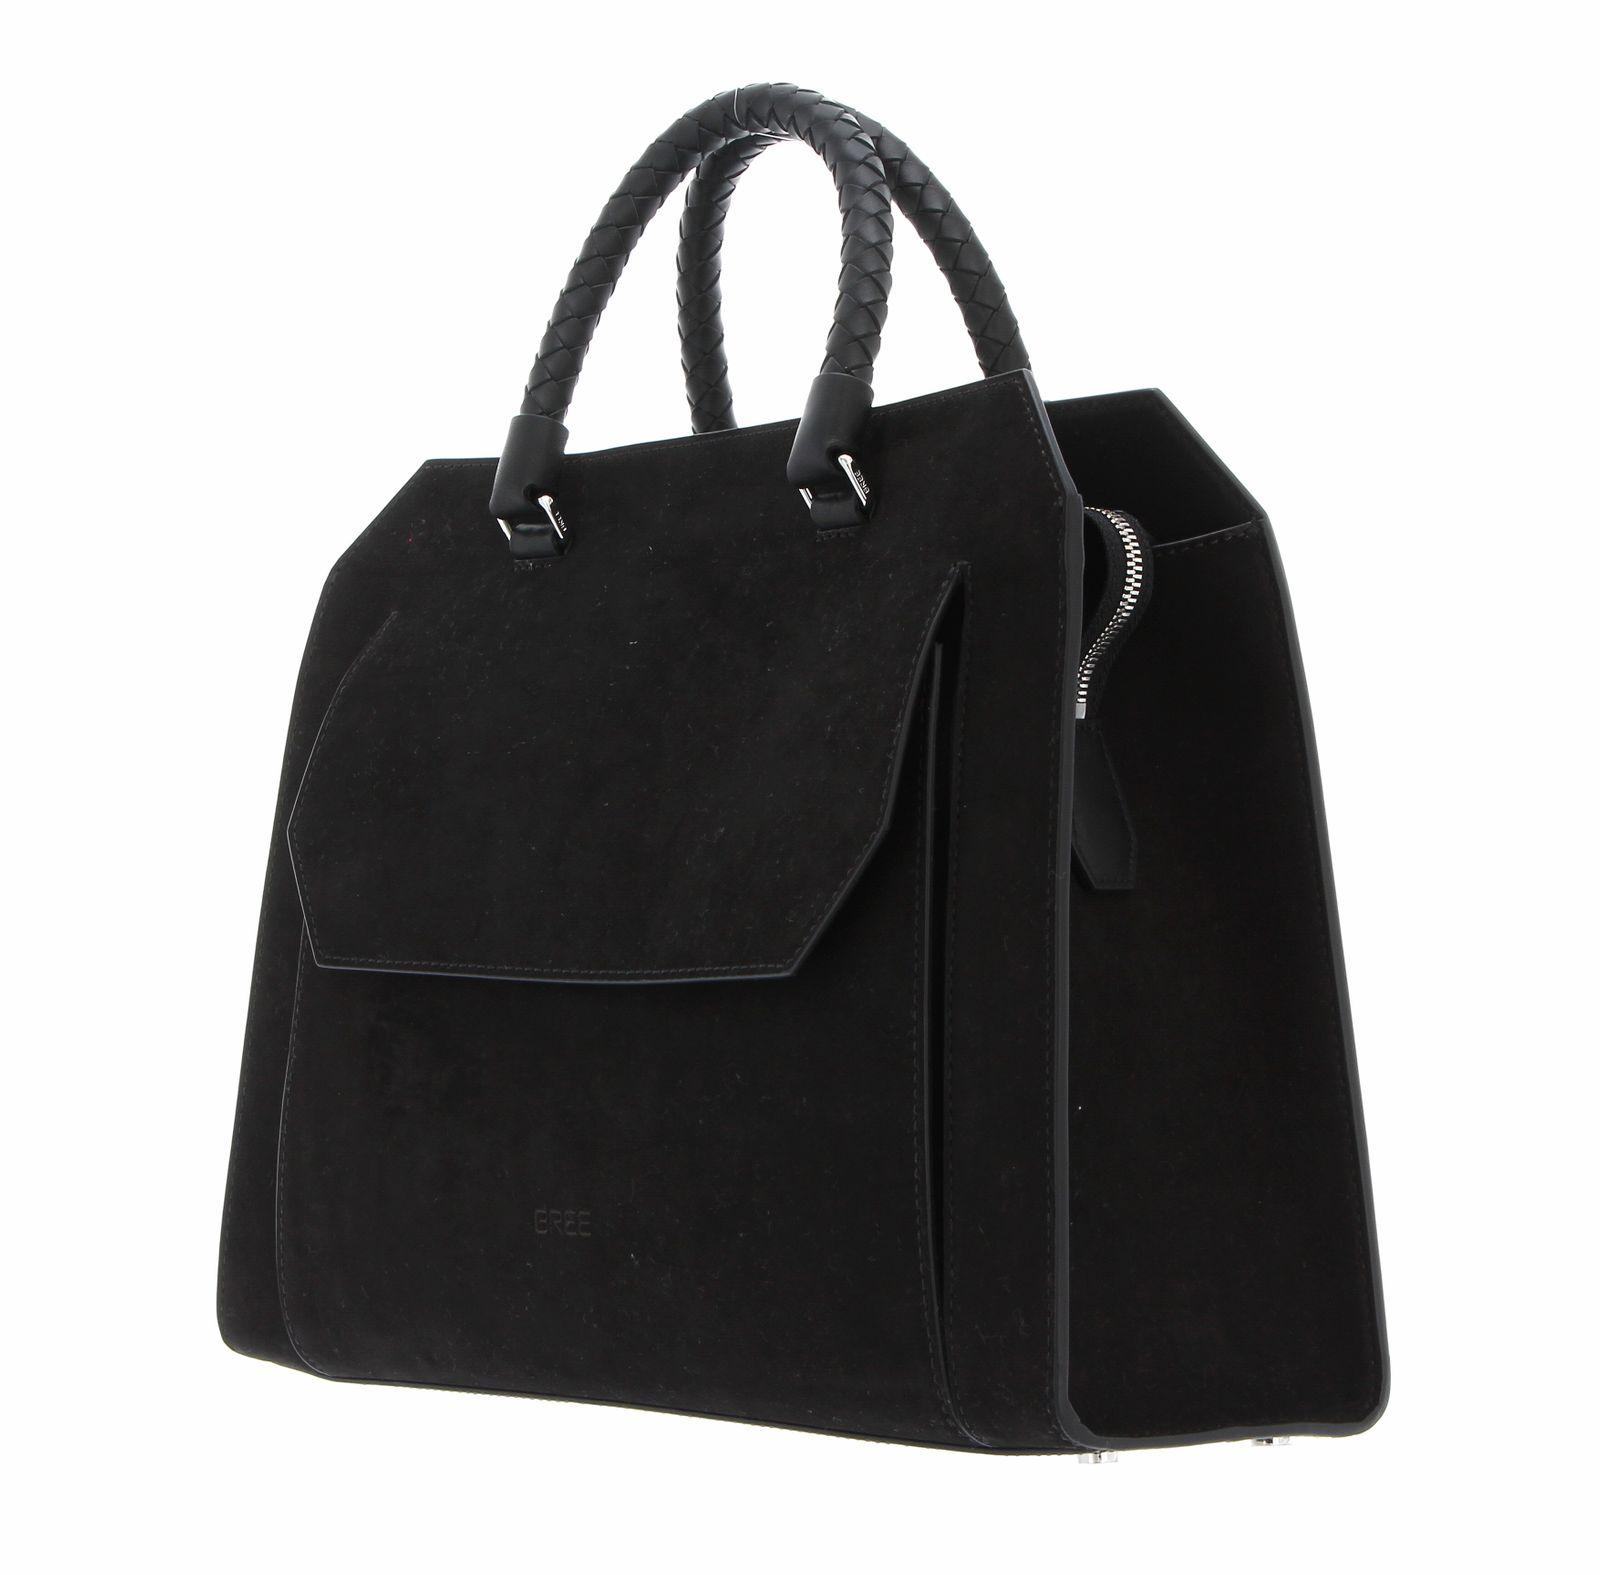 BREE Cambridge 13 Braided Top Handle Bag Black